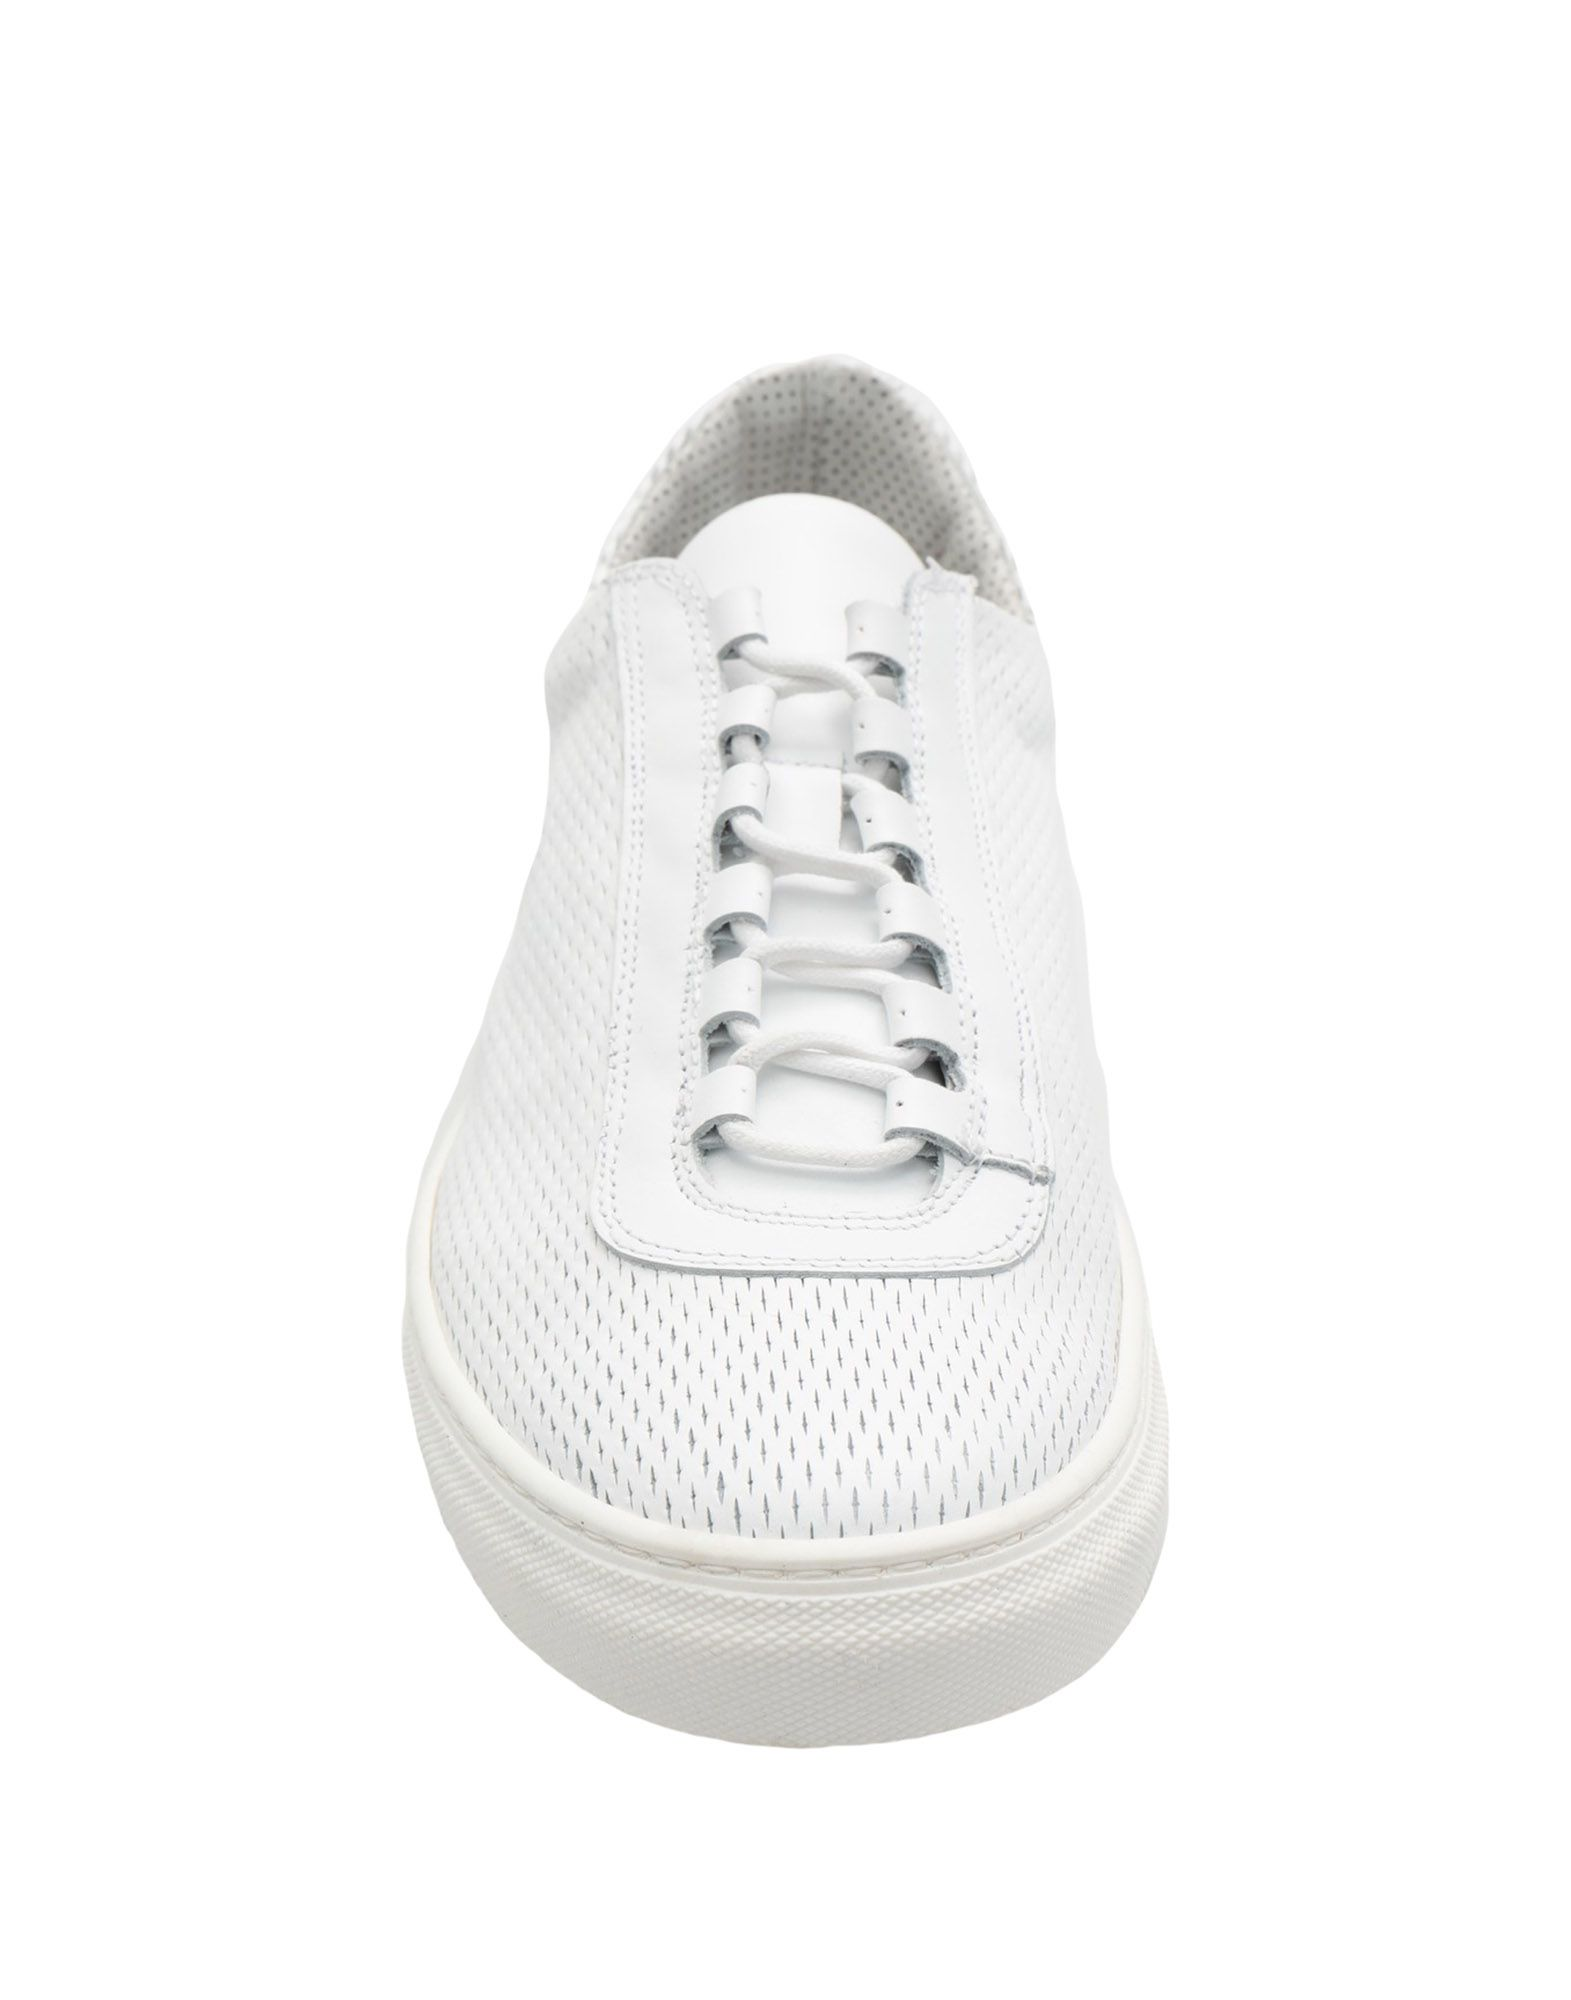 Herren Edwa Sneakers Herren   11458278XJ Heiße Schuhe 12a0c7